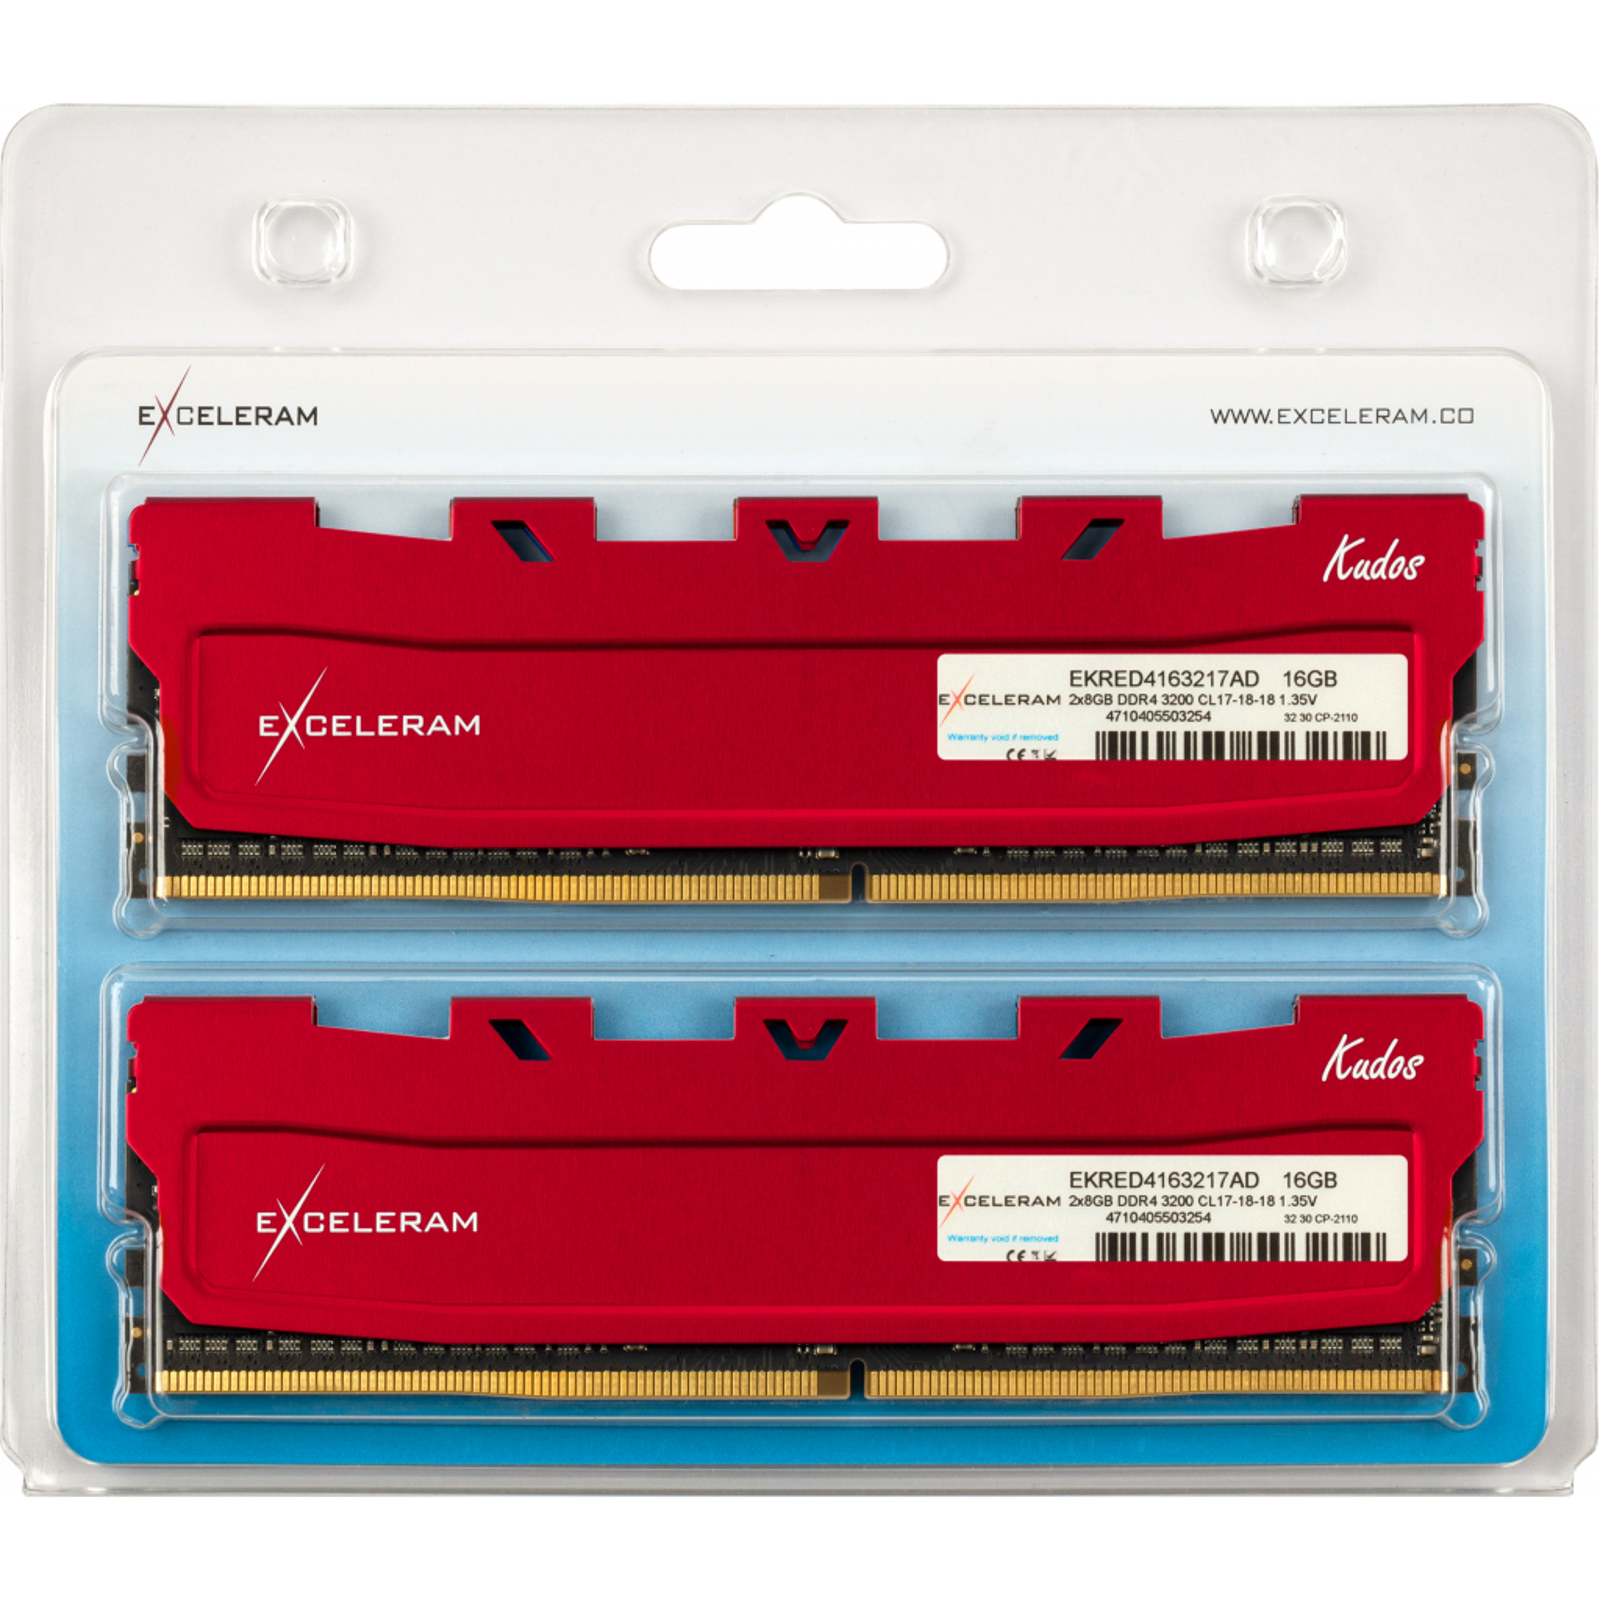 Модуль памяти для компьютера DDR4 16GB (2x8GB) 3200 MHz Kudos Red eXceleram (EKRED4163217AD) изображение 2